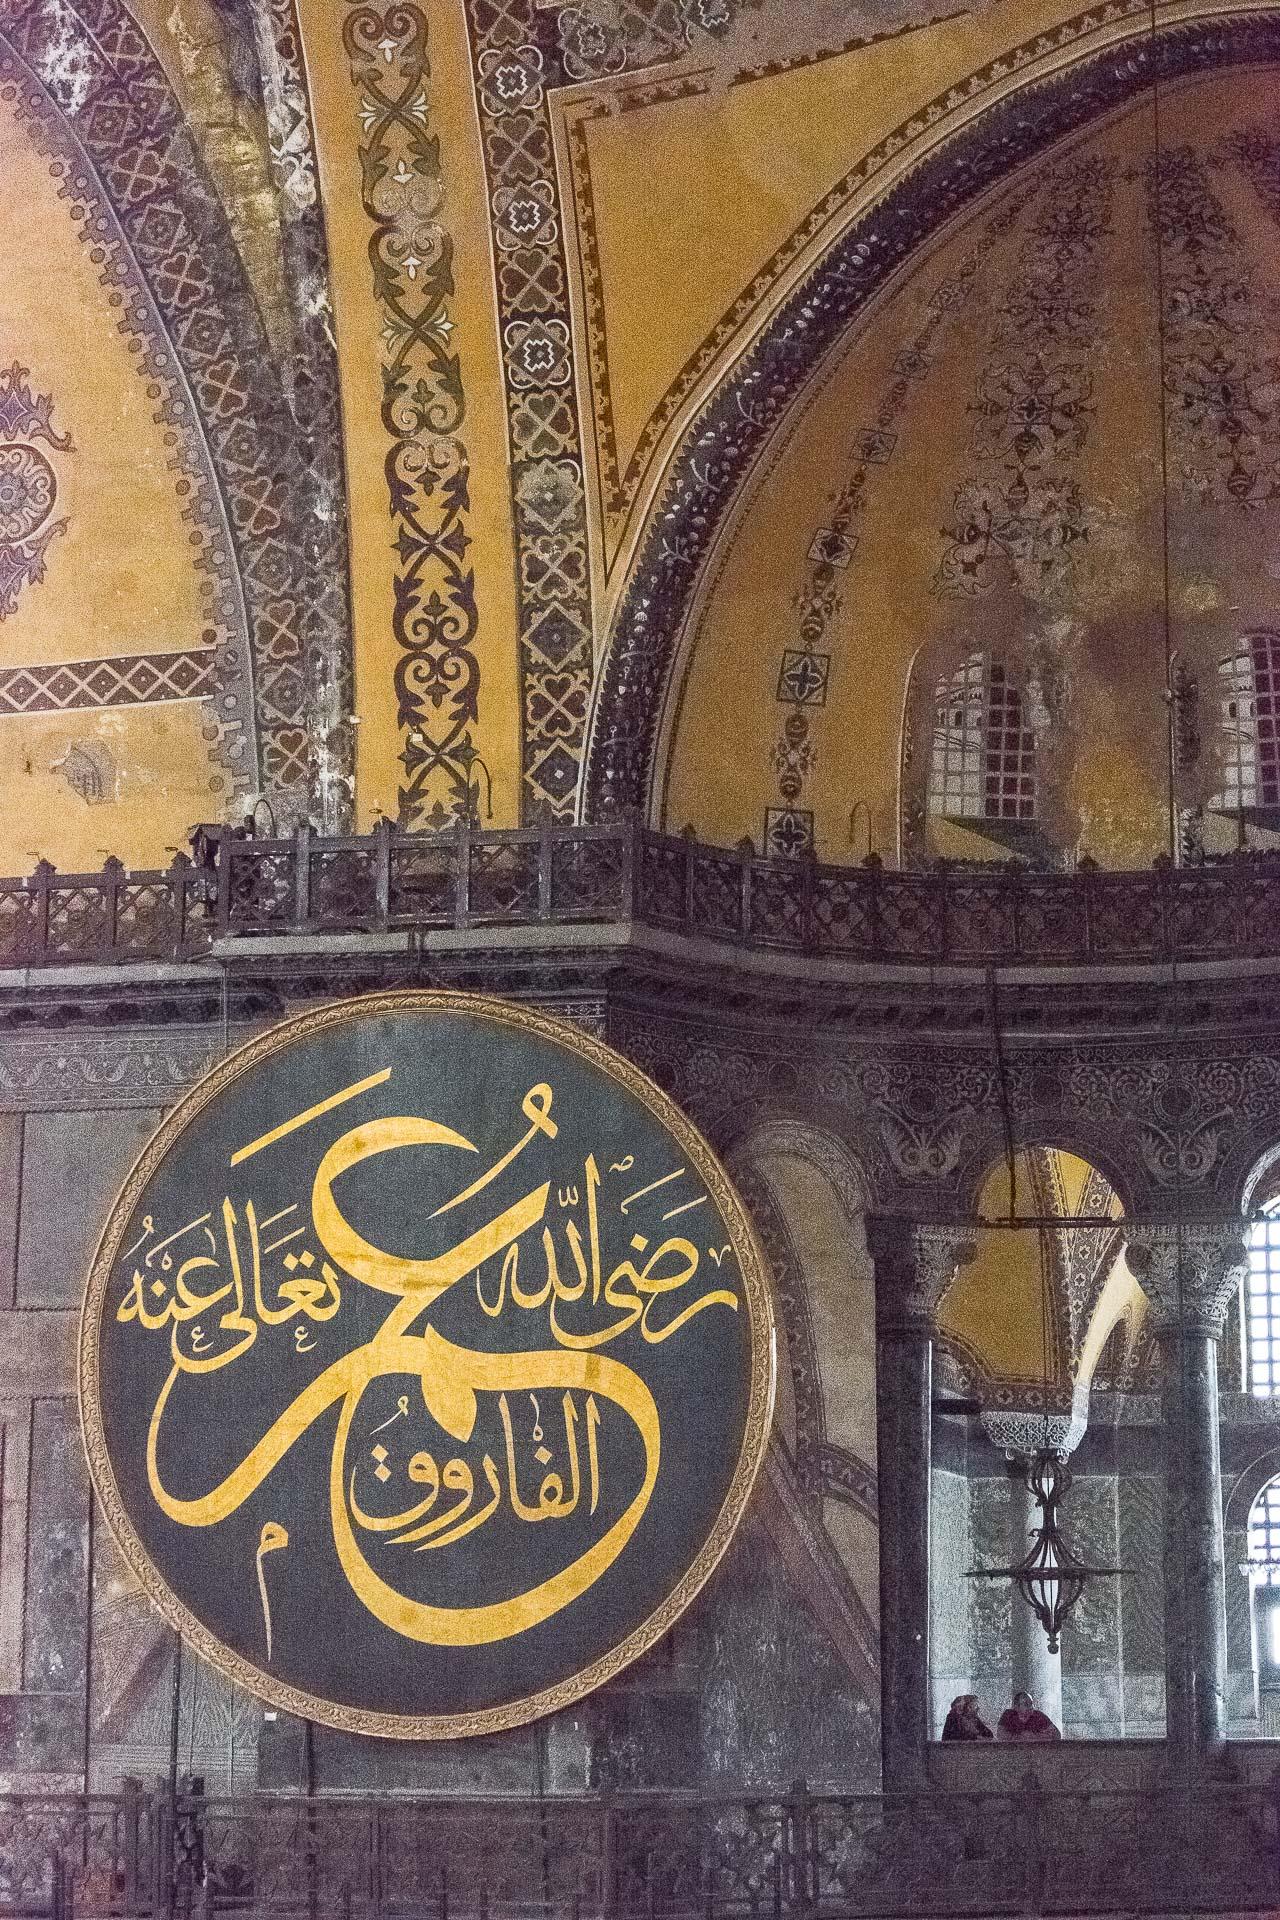 Interior, Hagia Sofia, Istanbul, Turkey